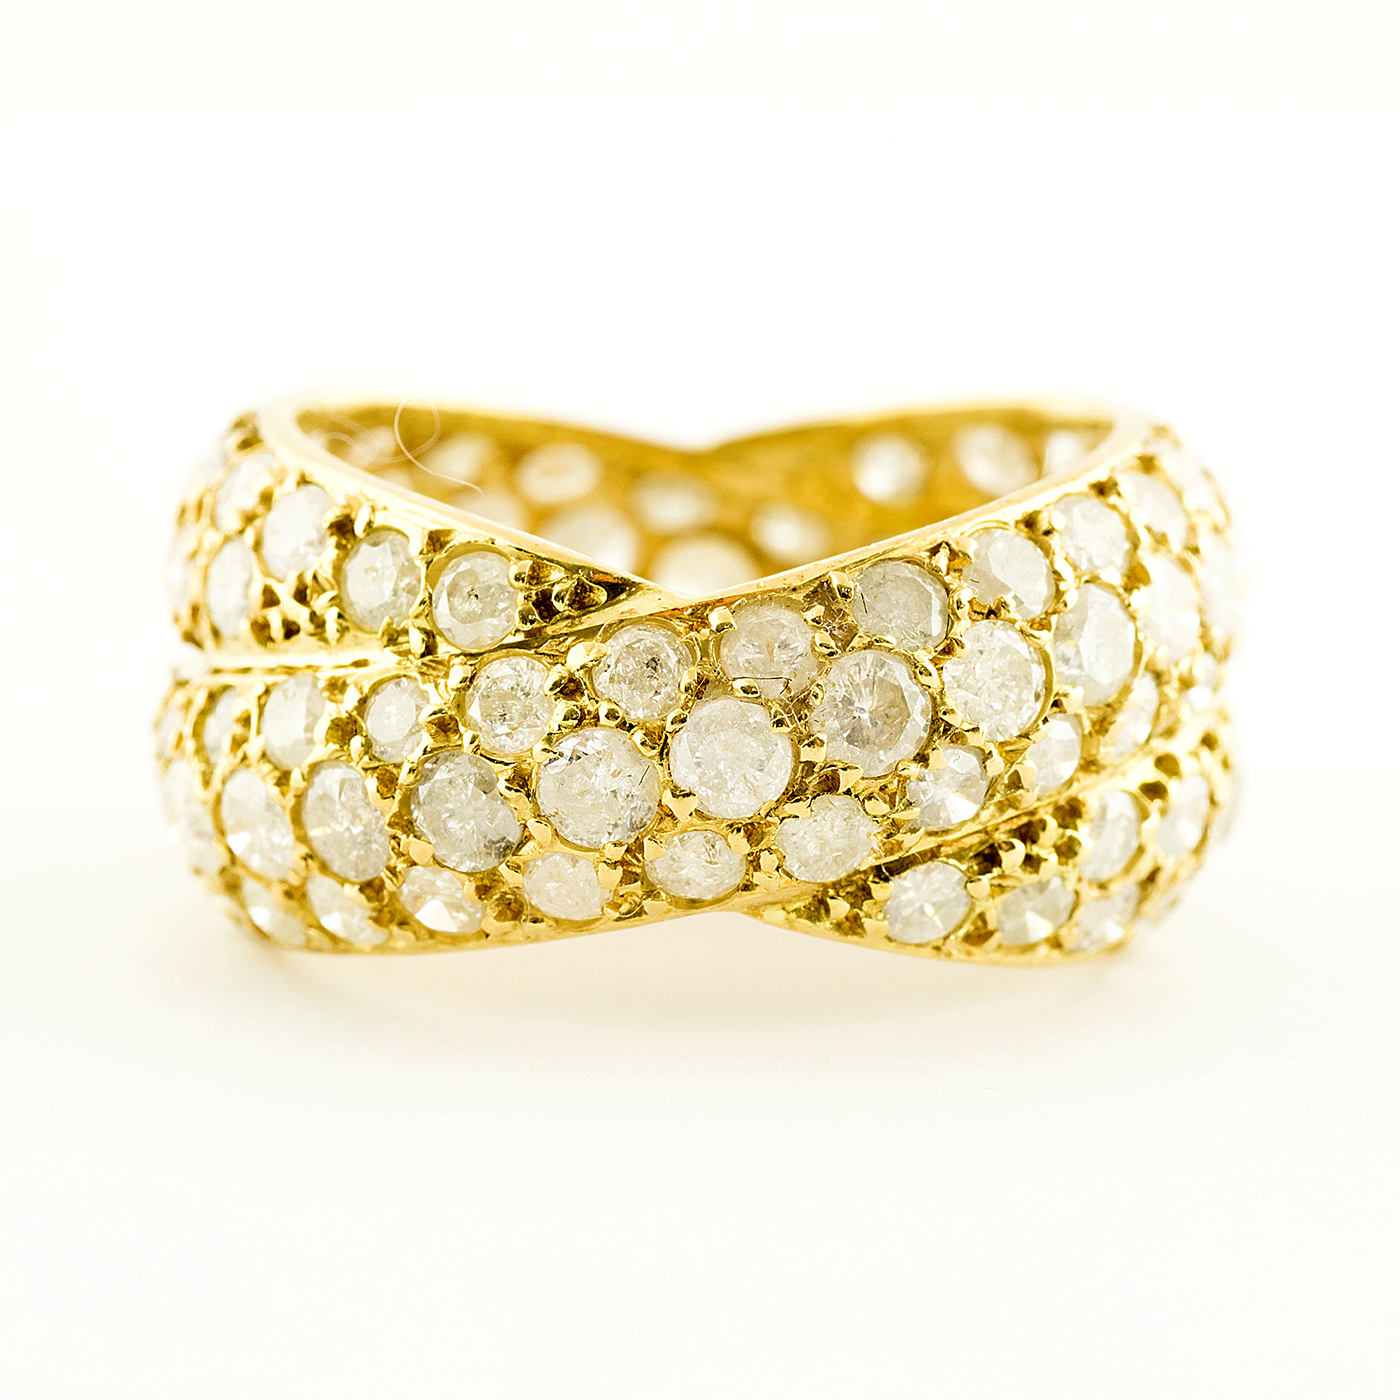 Anillo de Oro de 18k. con 116 Diamantes Naturales Talla Brillante de 3,72 ct. total (K-L/I3). Certificado IGE